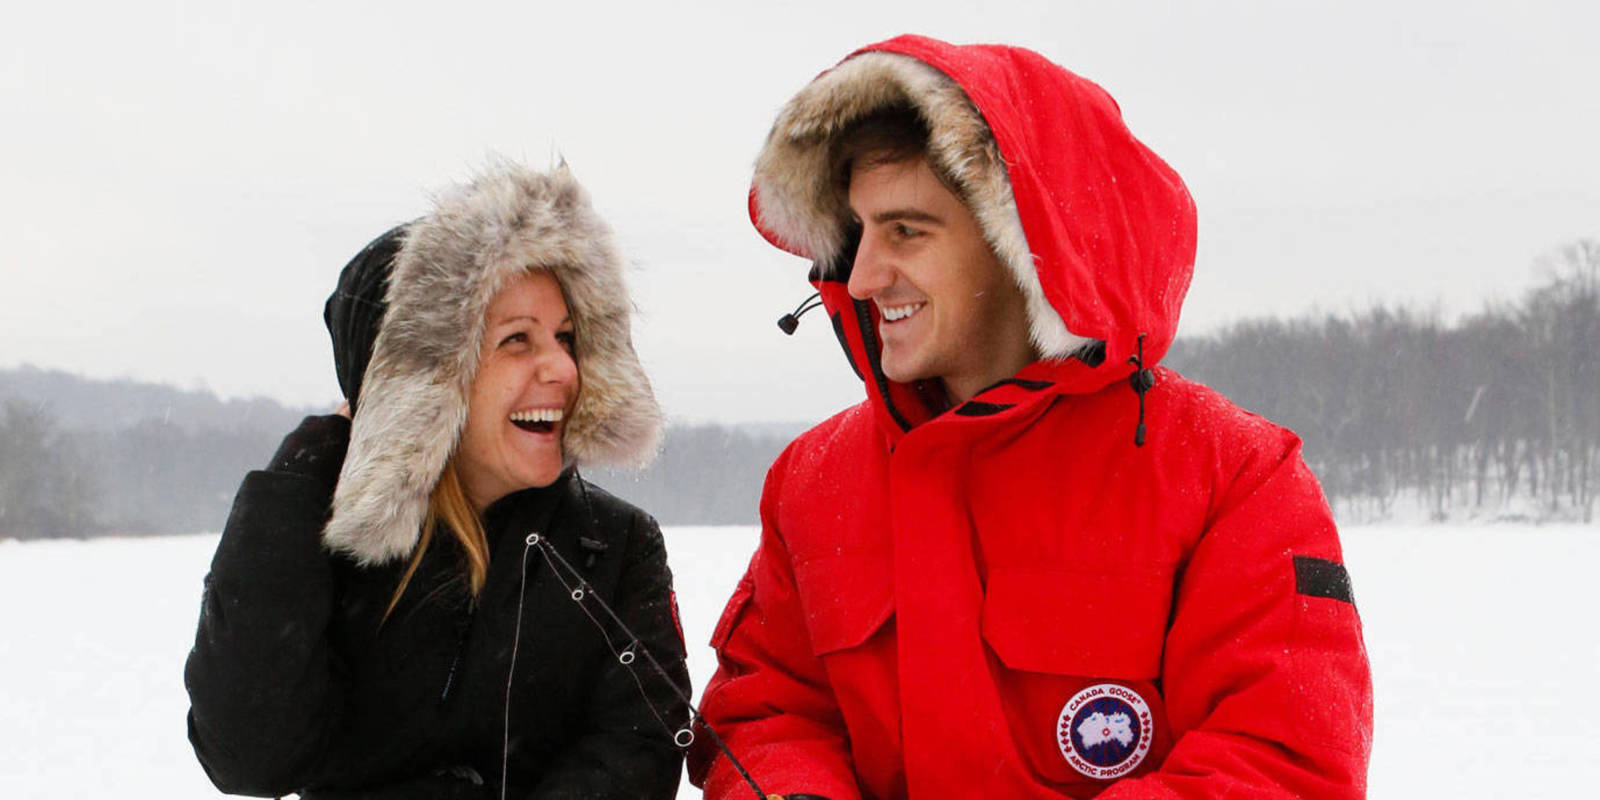 Amazon.com: Canada Goose Men's Expedition Parka Coat: Sports & Outdoors. canada goose arctic program